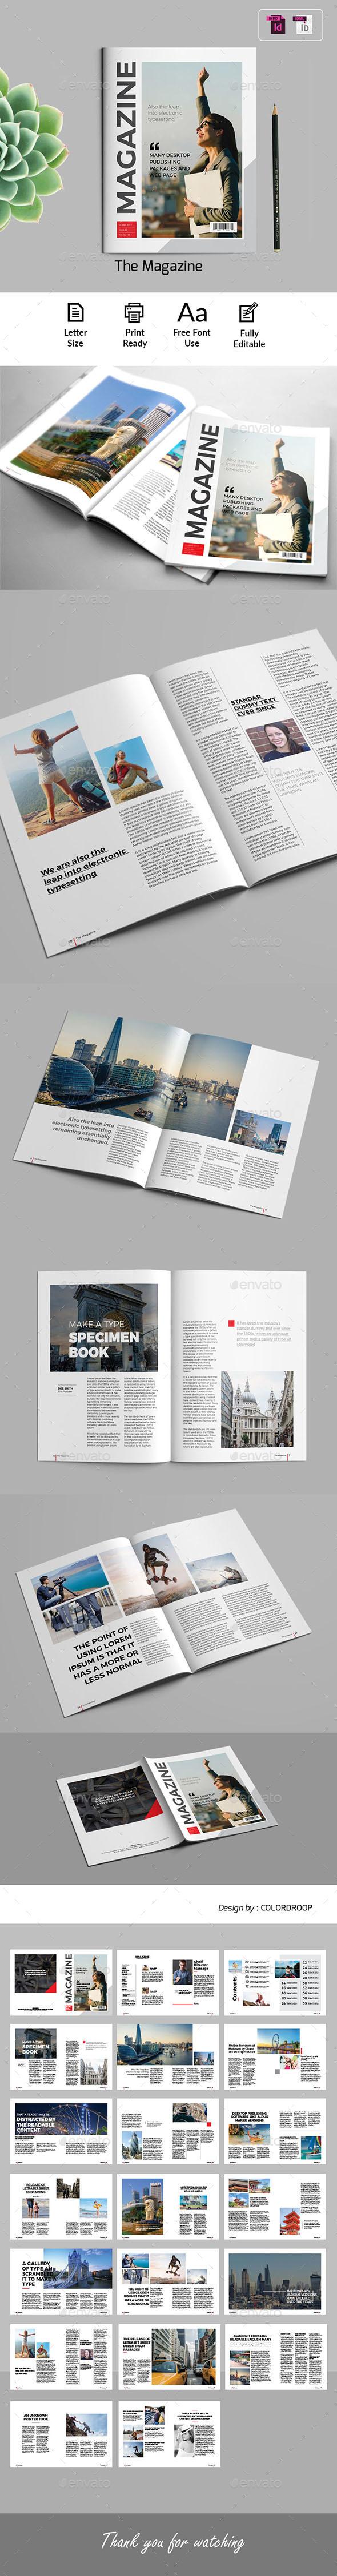 The Magazine Template - Magazines Print Templates